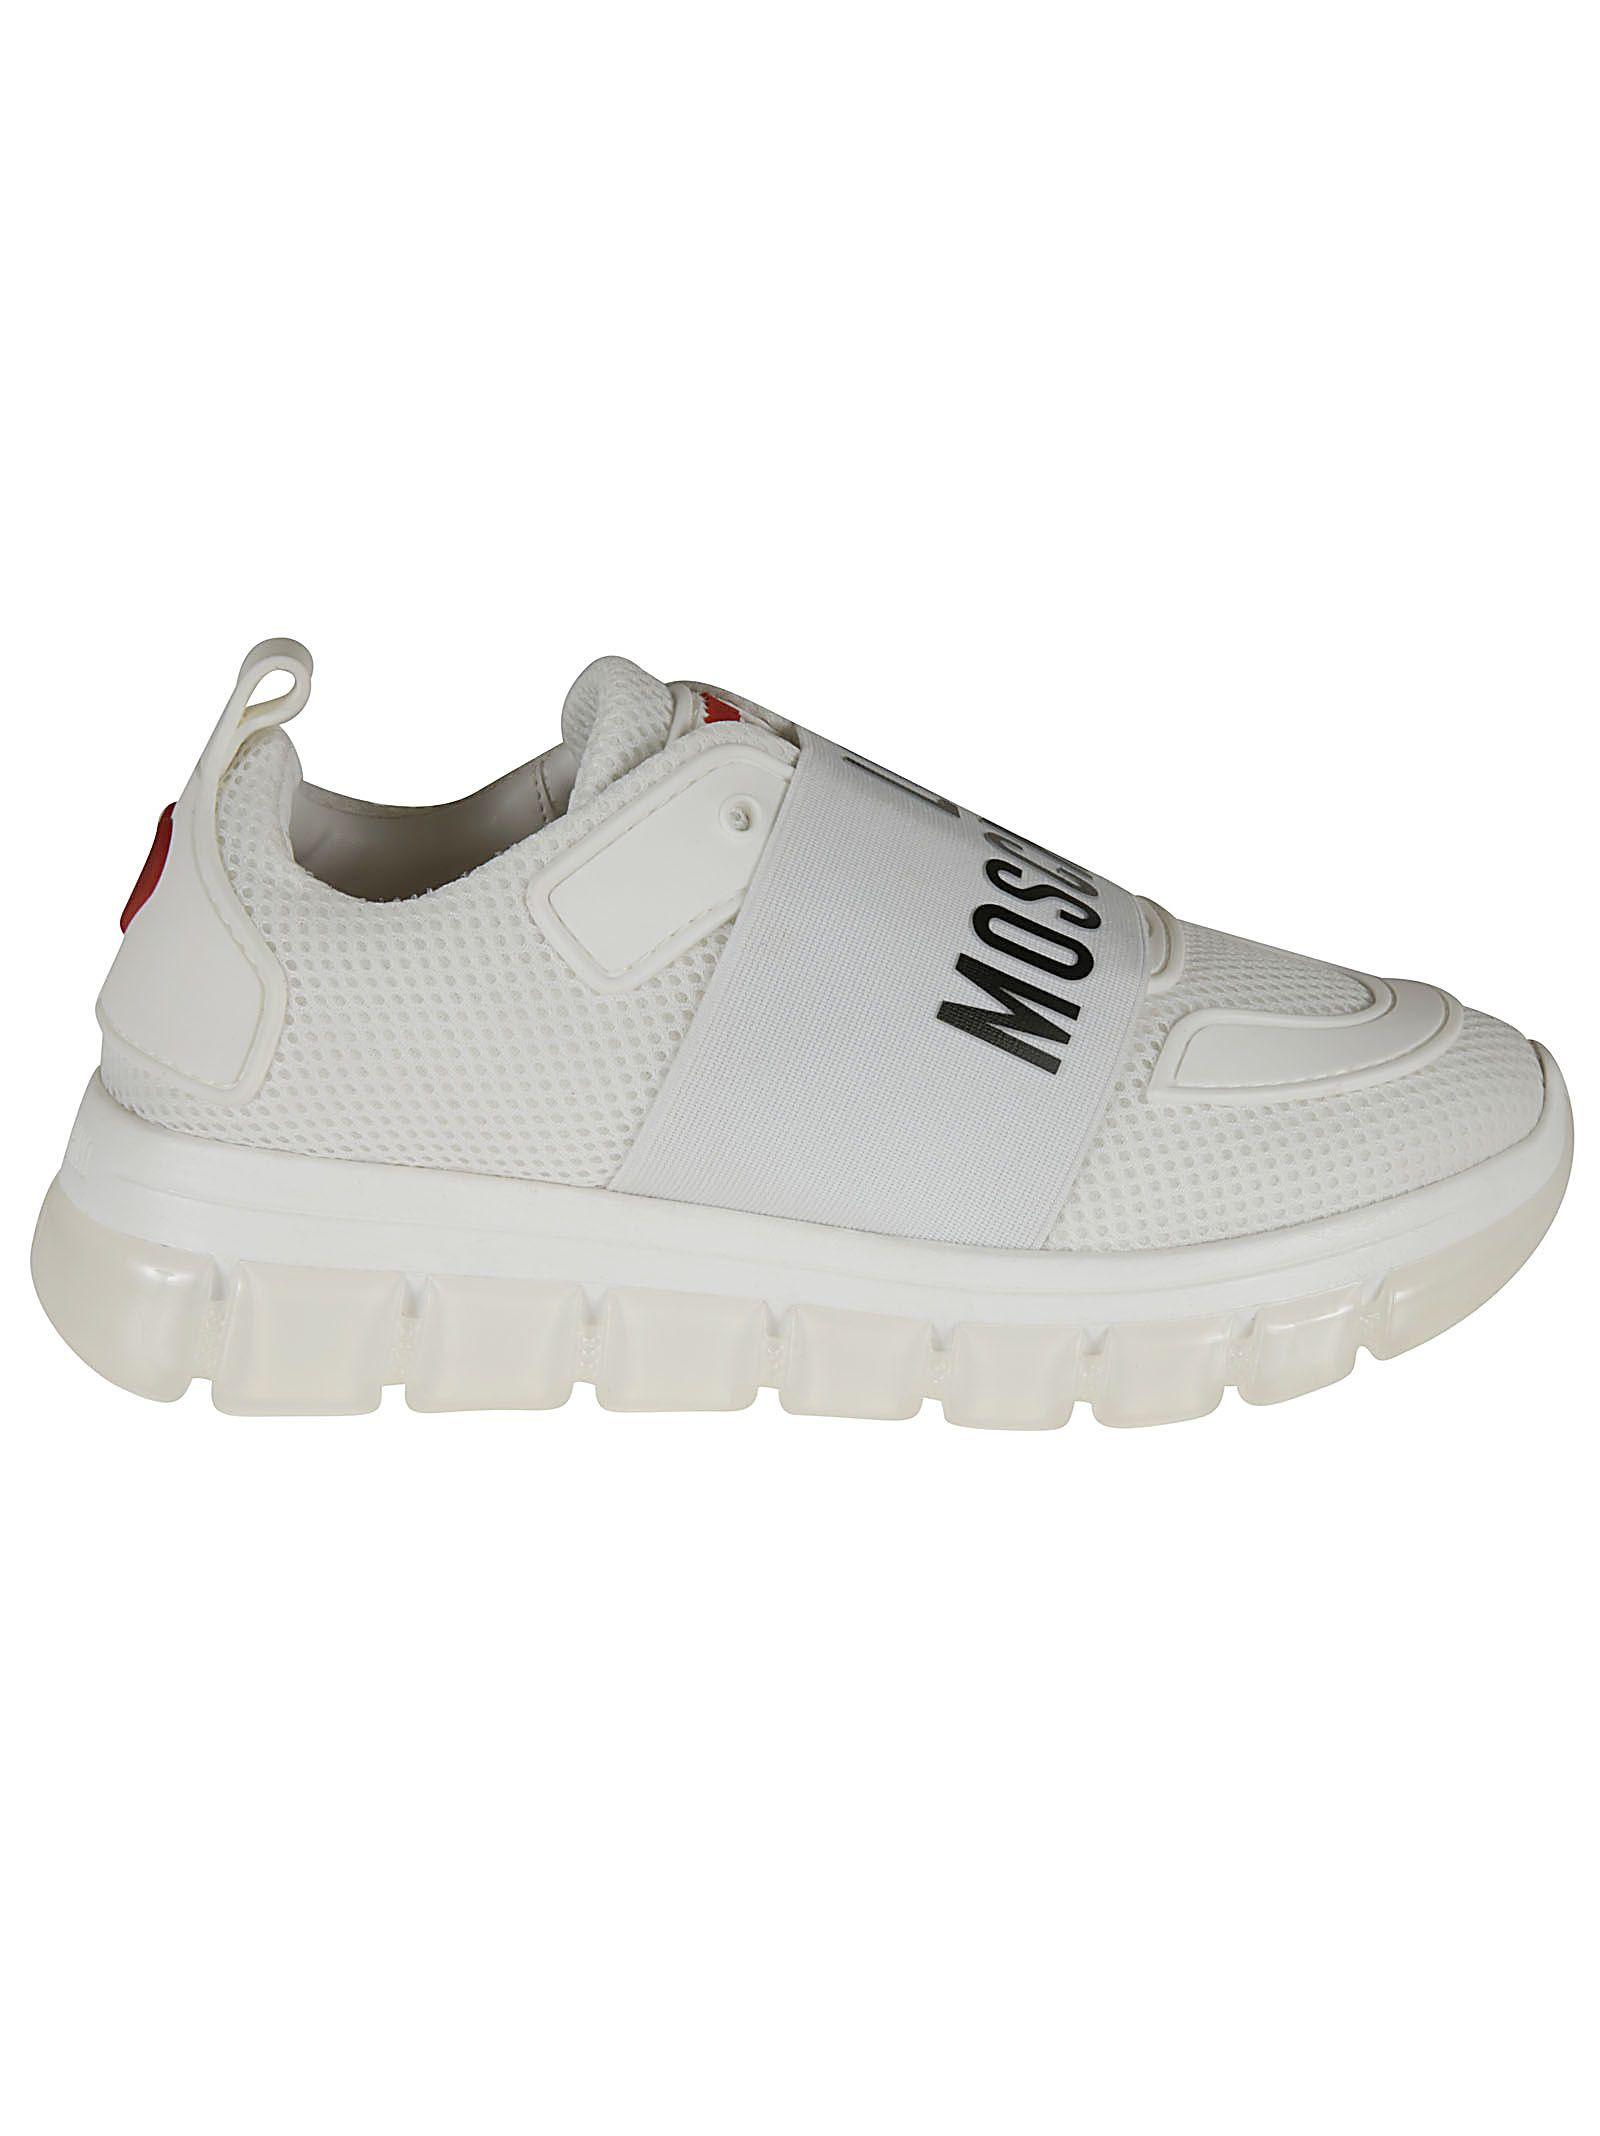 Love Moschino Sneakers   italist